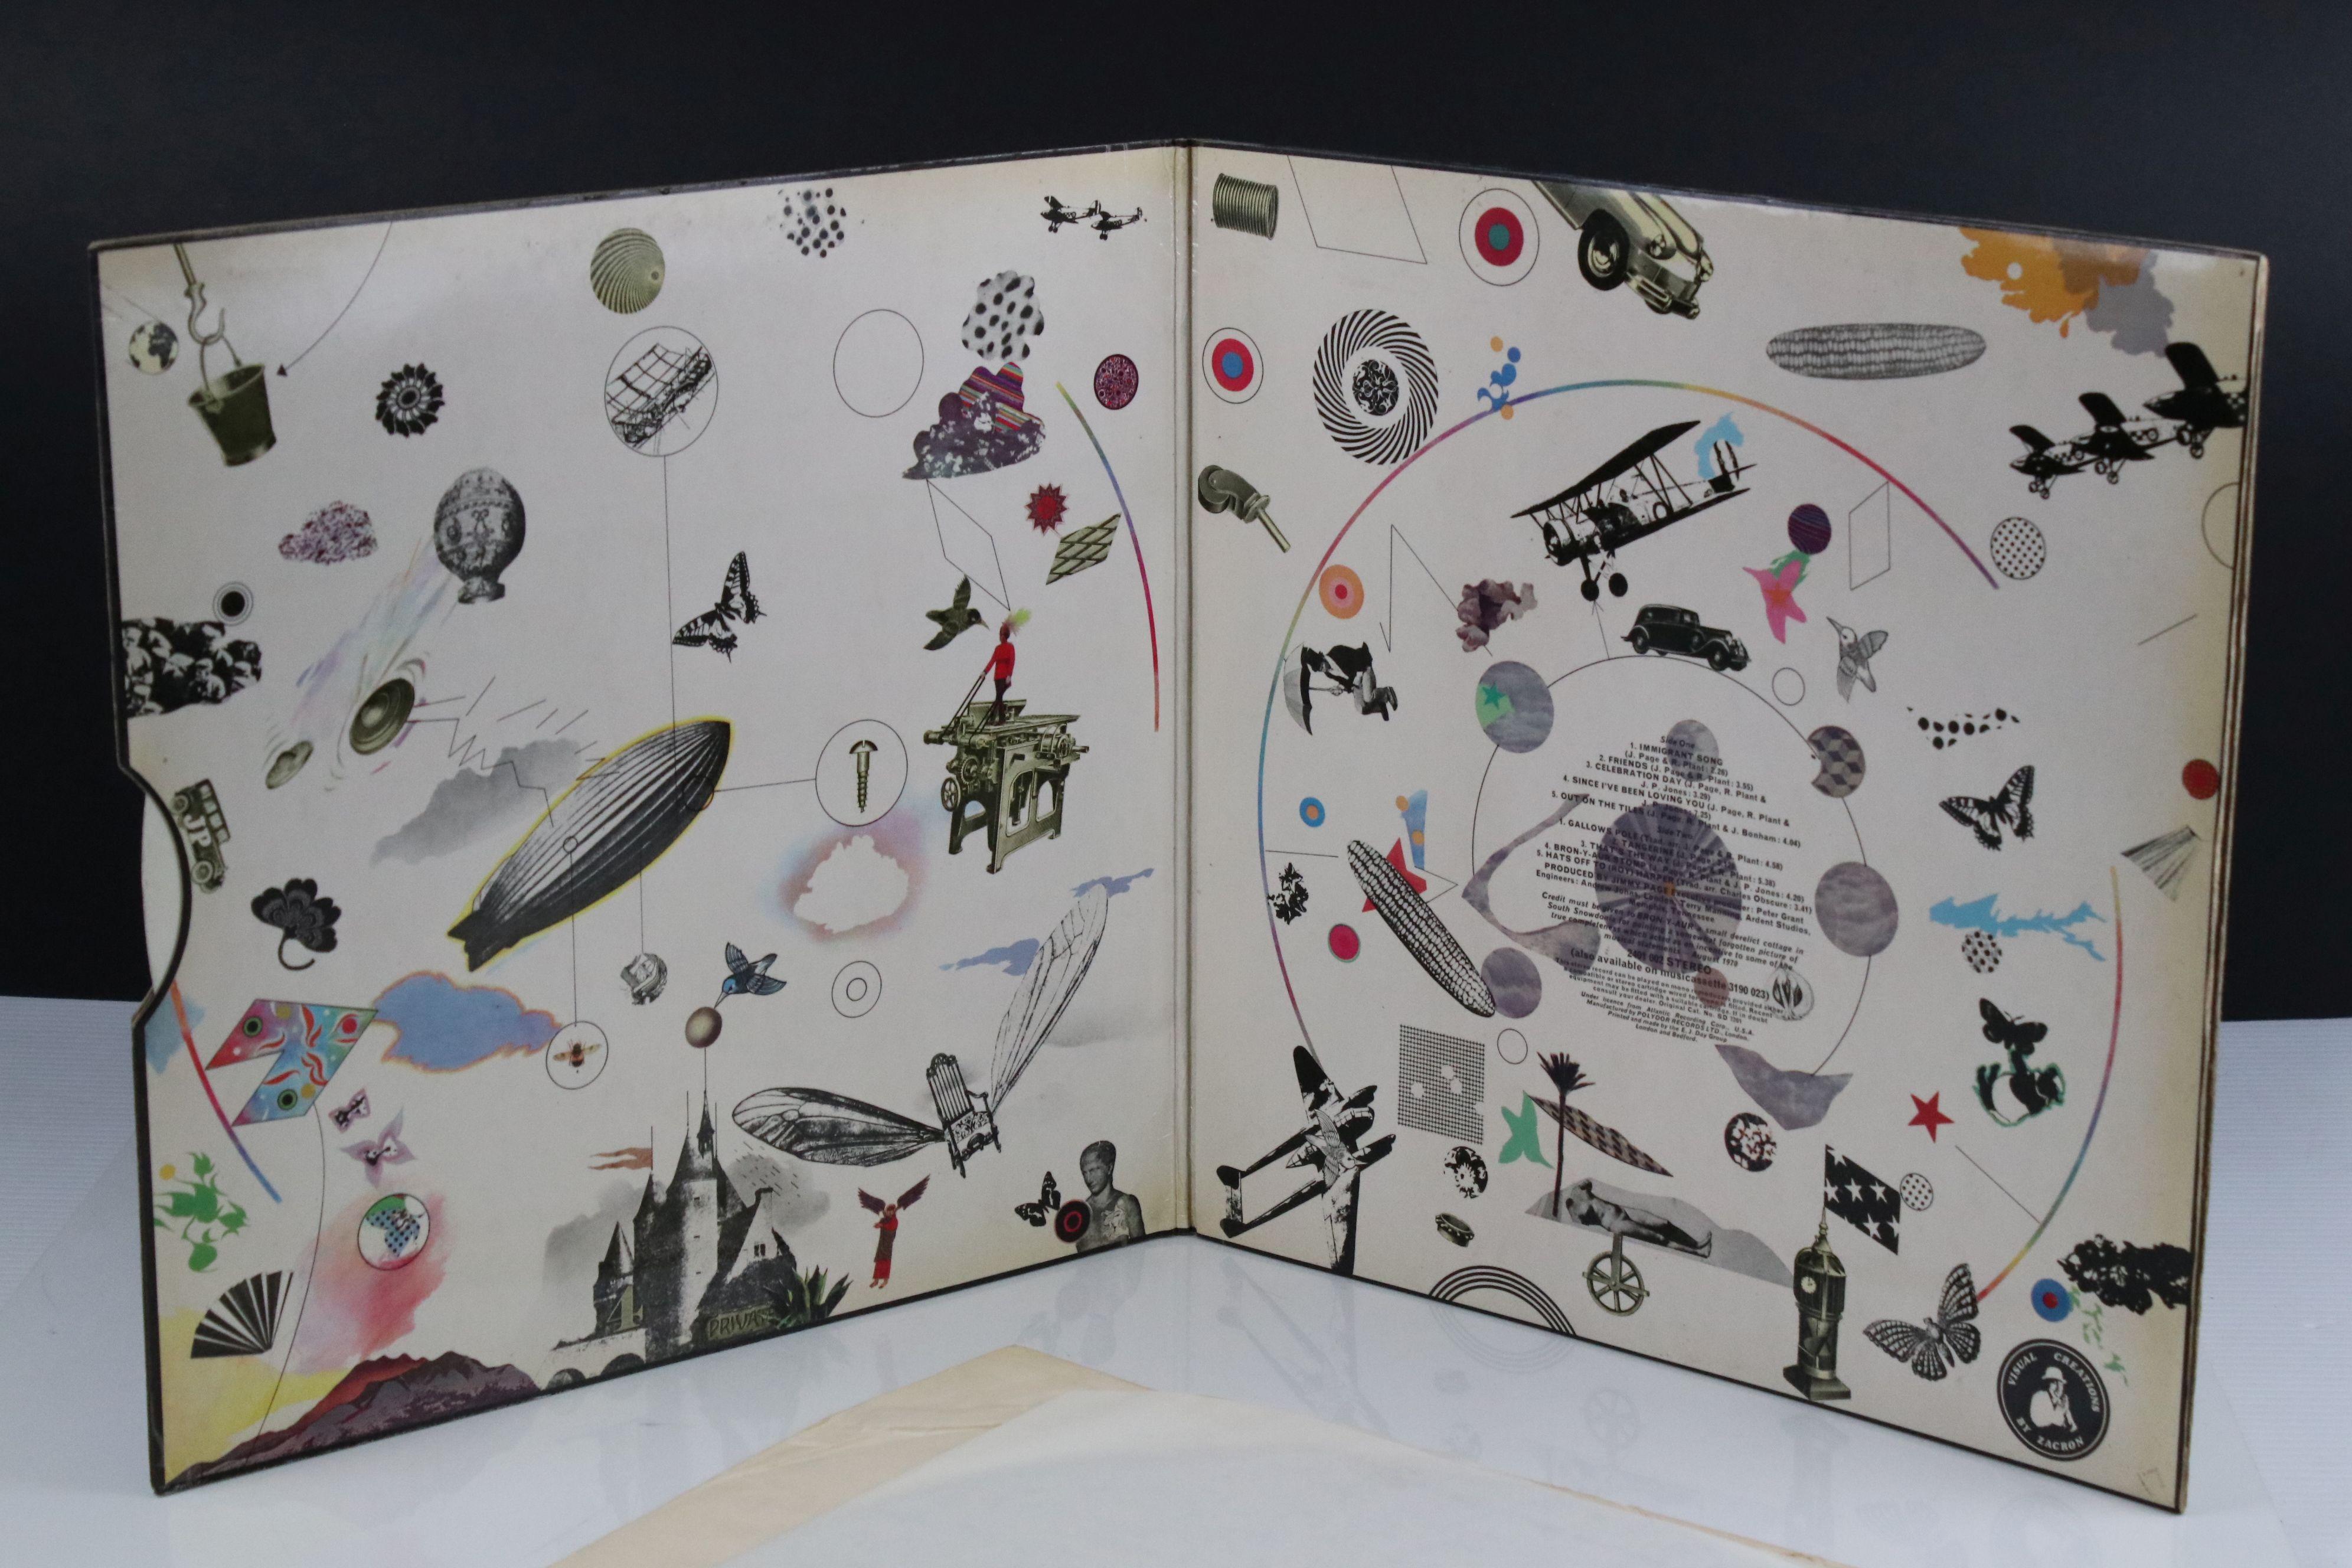 Vinyl - Led Zeppelin III LP on Atlantic Deluxe 2401002 red/maroon label, 1st pressing, sleeve vg - Image 6 of 7